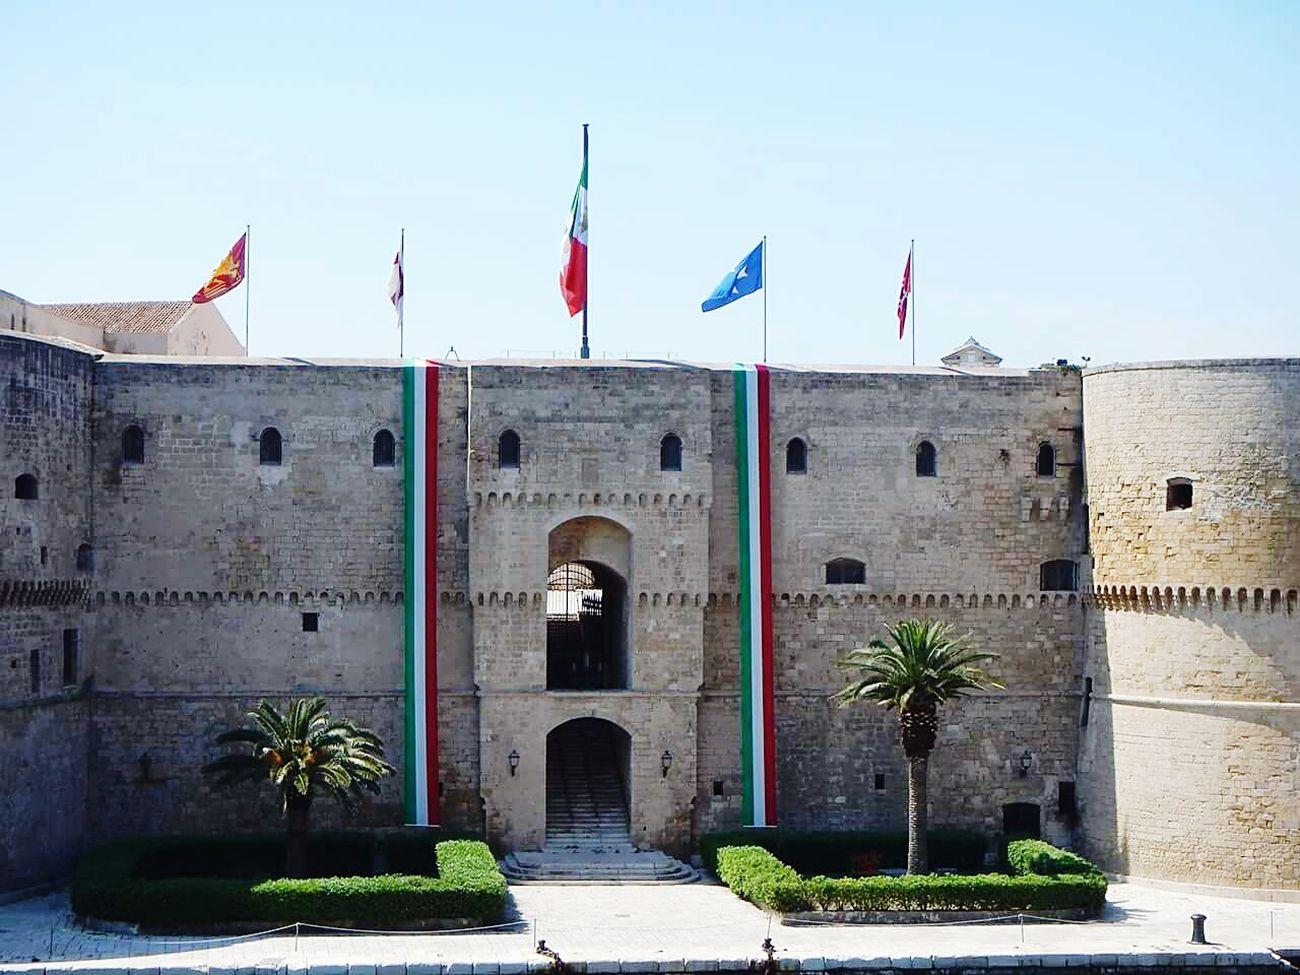 25 Aprile Festa 25 Aprile Castello Aragonese Taranto Lungomare